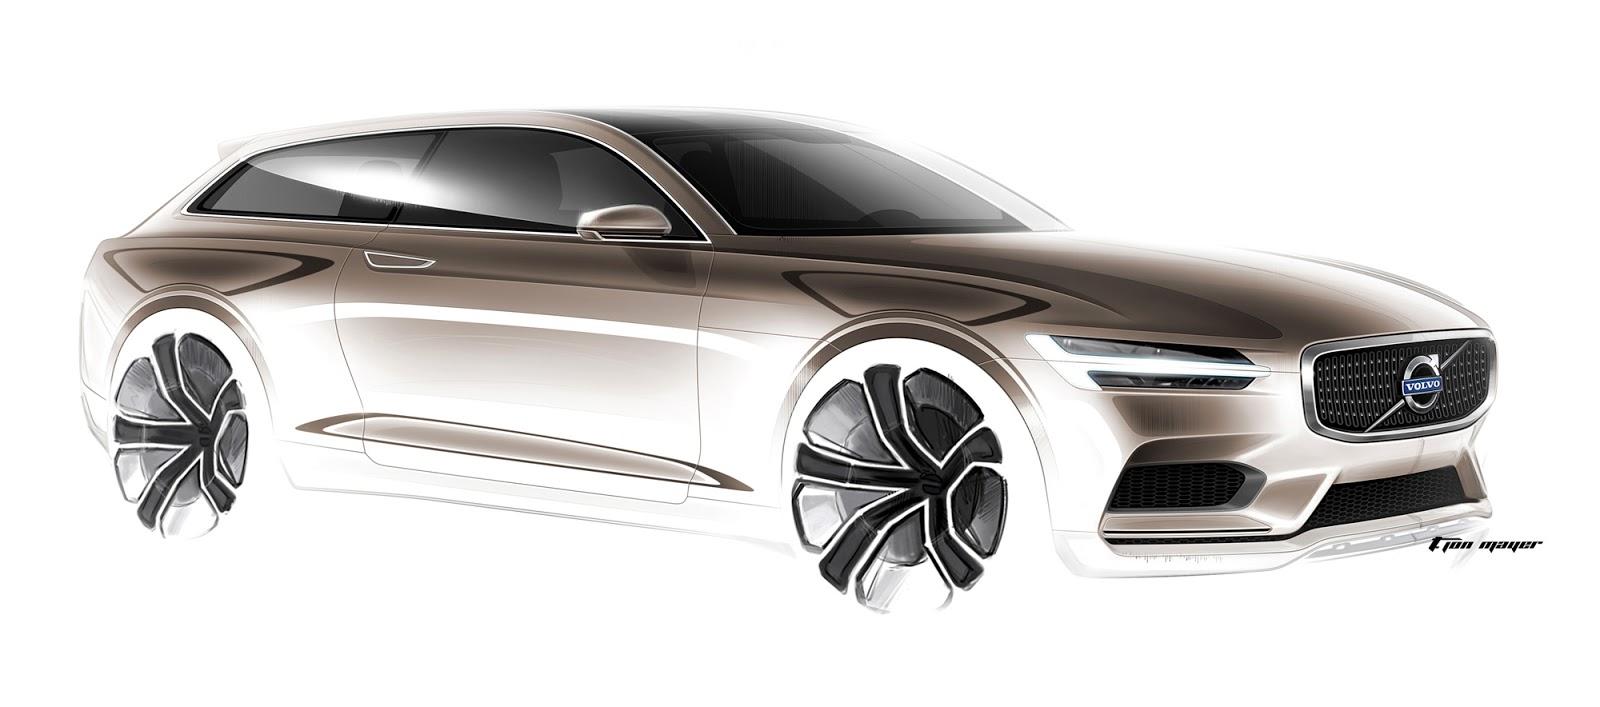 Volvo Concept Estate sketch front quarter view by T. Jon Mayer